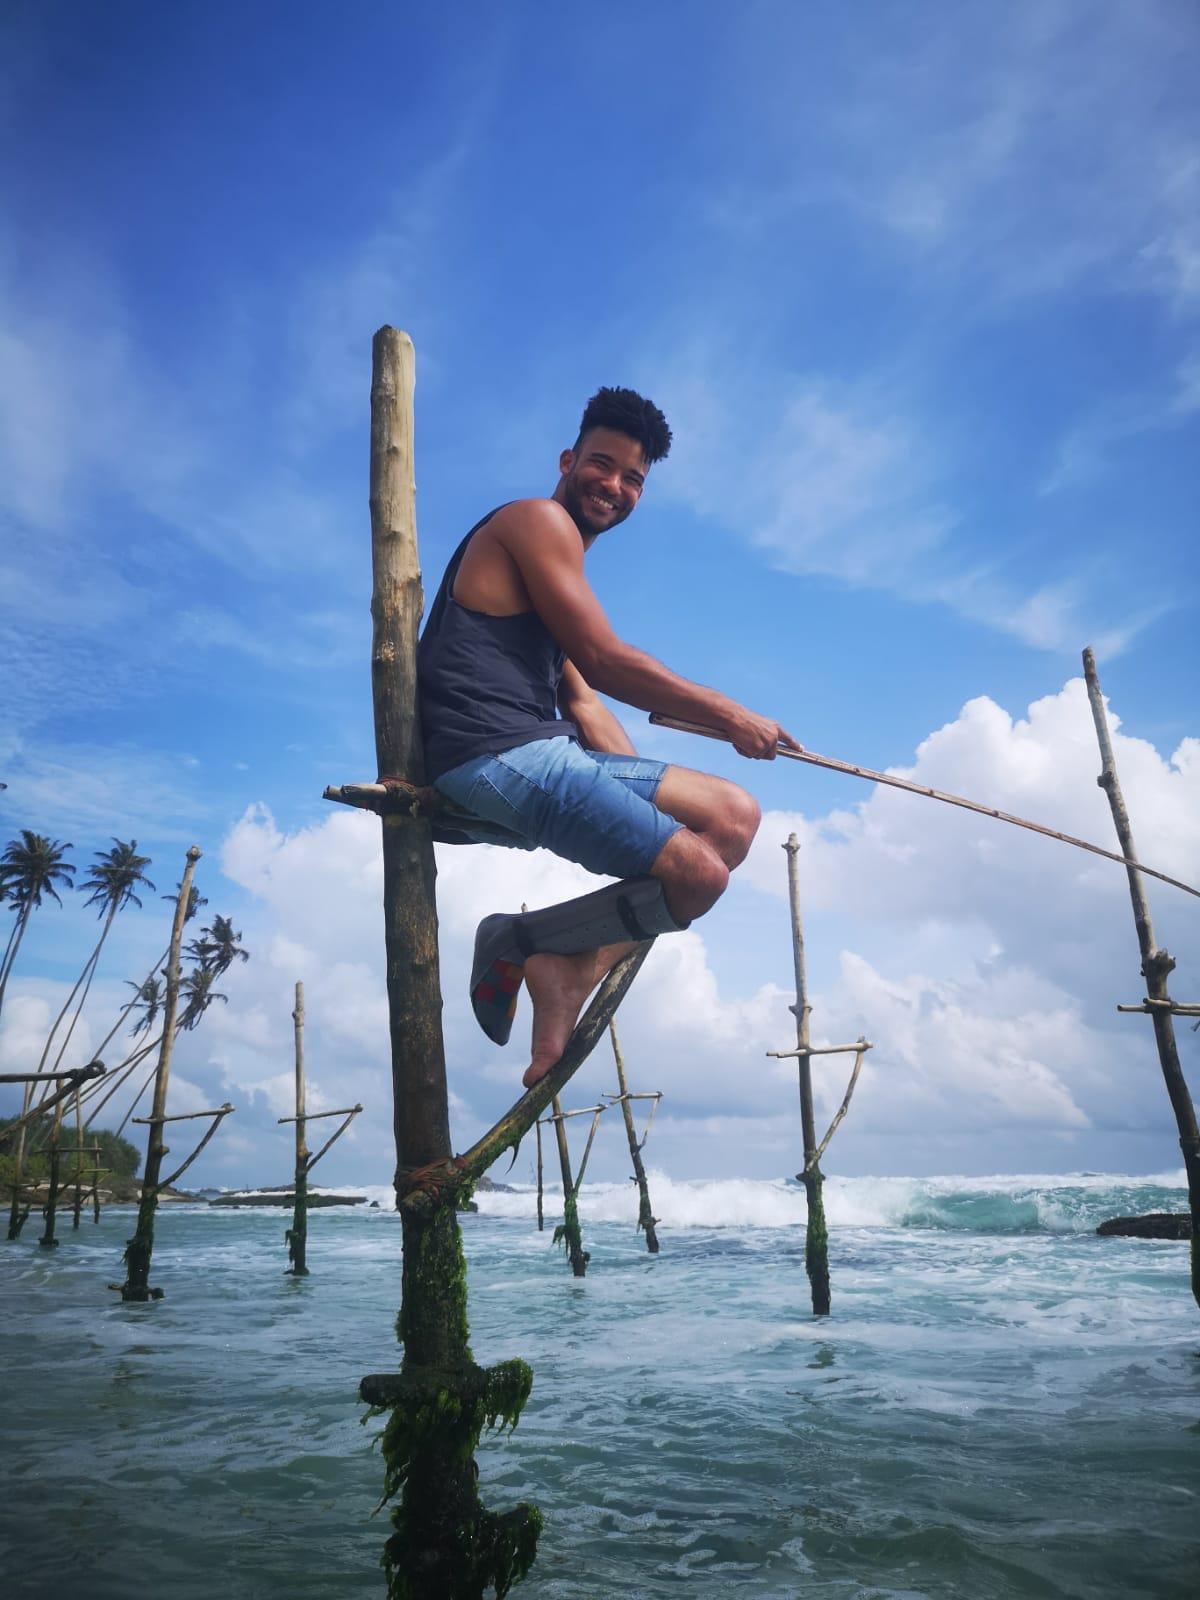 invite-to-paradise-sri-lanka-holiday-honeymoon-specialists-customer-feedback-elin-jordan-luce-stilt-fishing-try.JPG